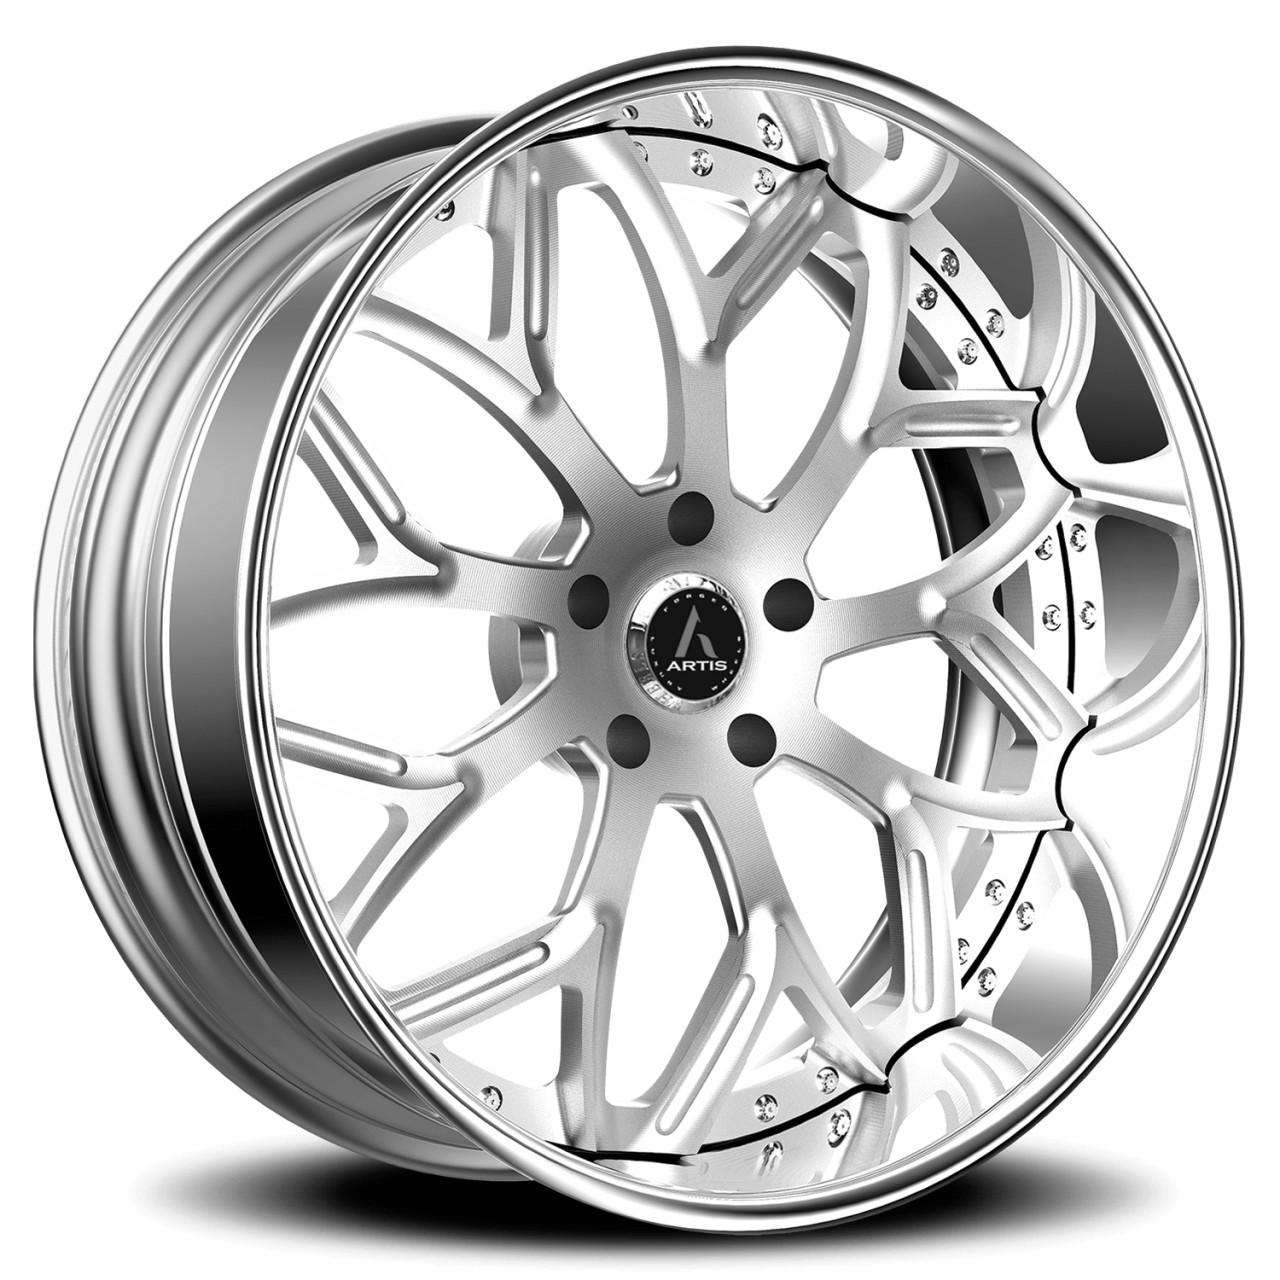 Artis Bulgari forged wheels